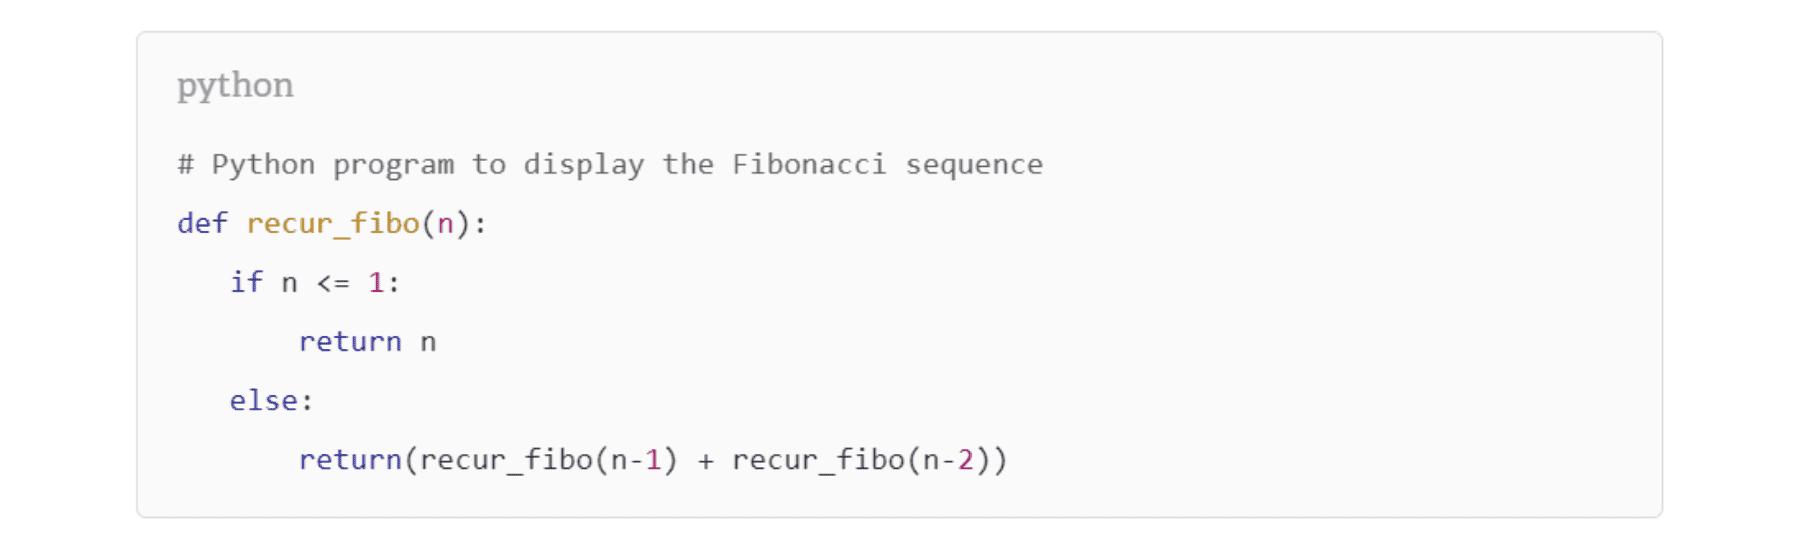 Python syntax highlighting